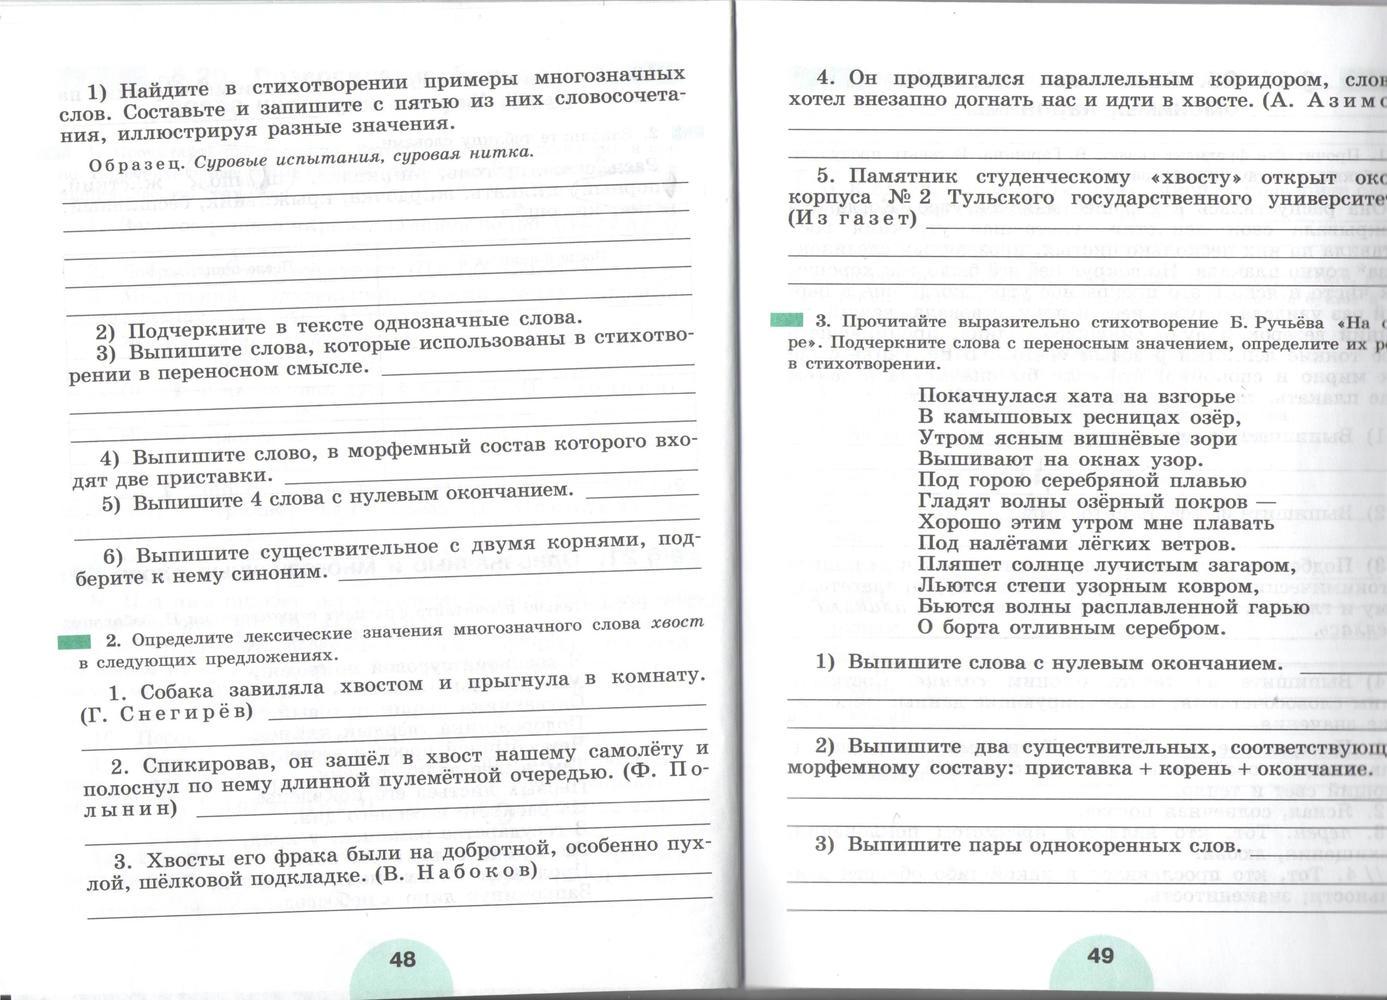 гдз решебник по русскому 9 класс рыбченкова